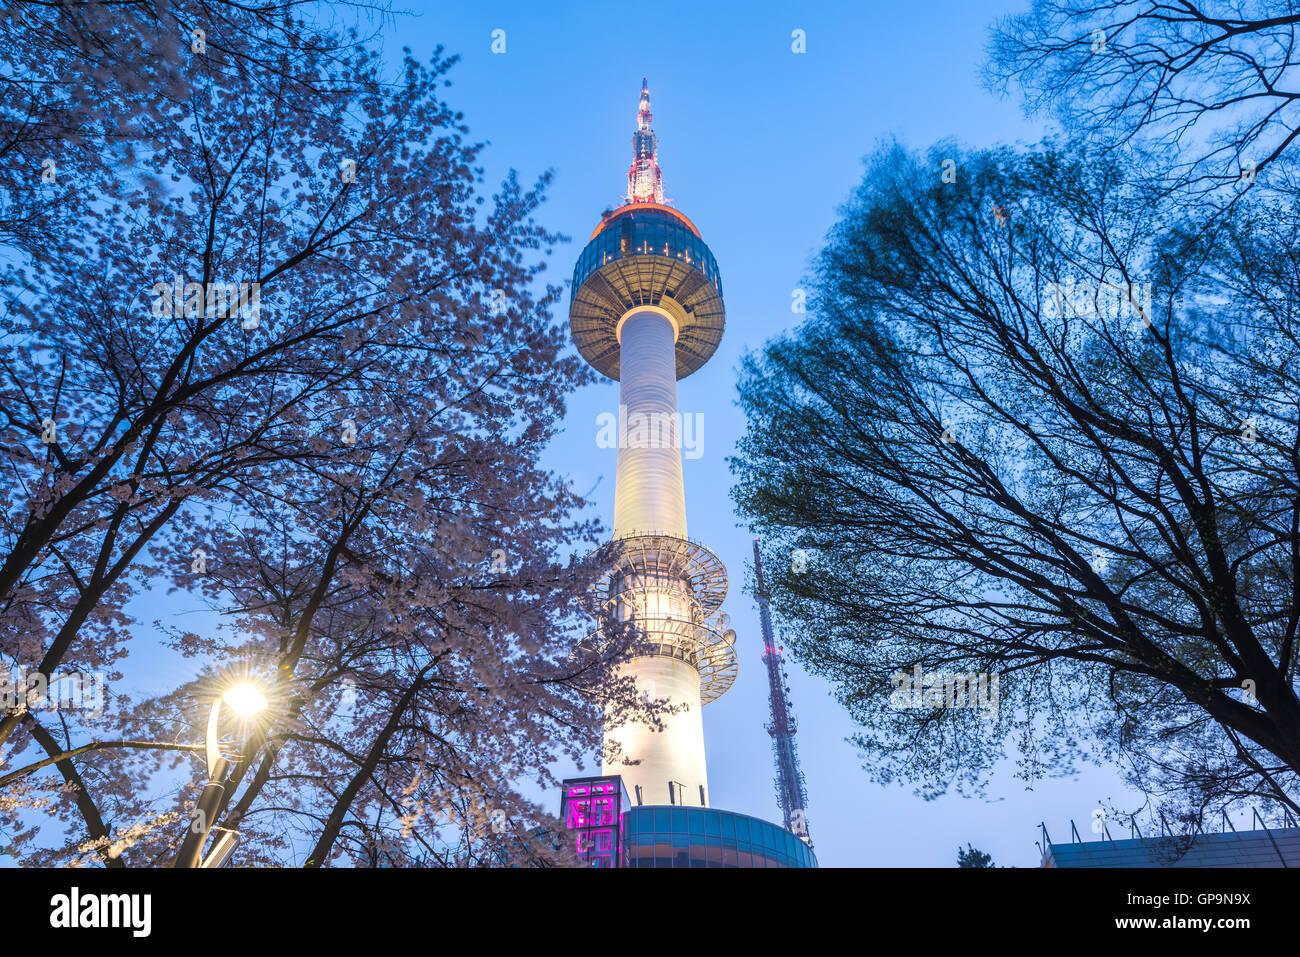 Torre di Seoul di notte a Seul, Corea del Sud Immagini Stock